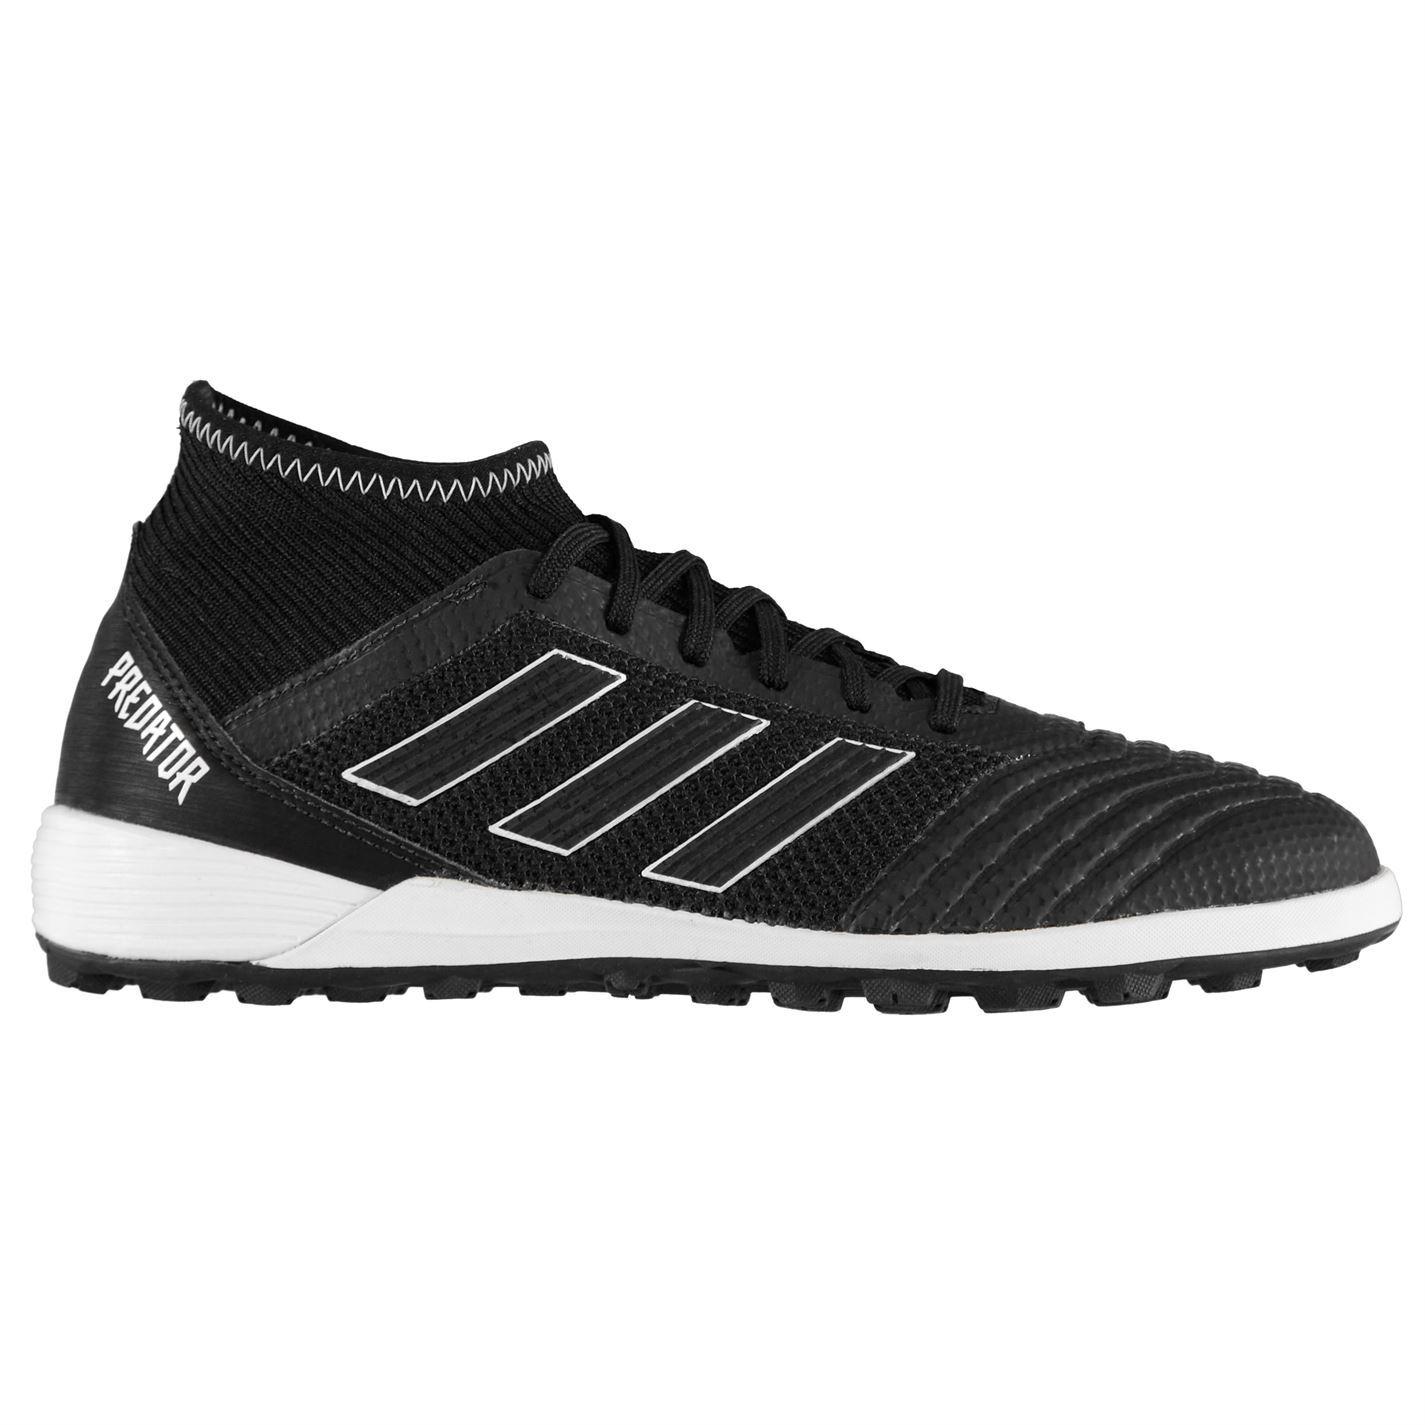 adidas Predator Tango18.3 Mens Astro Turf Trainers